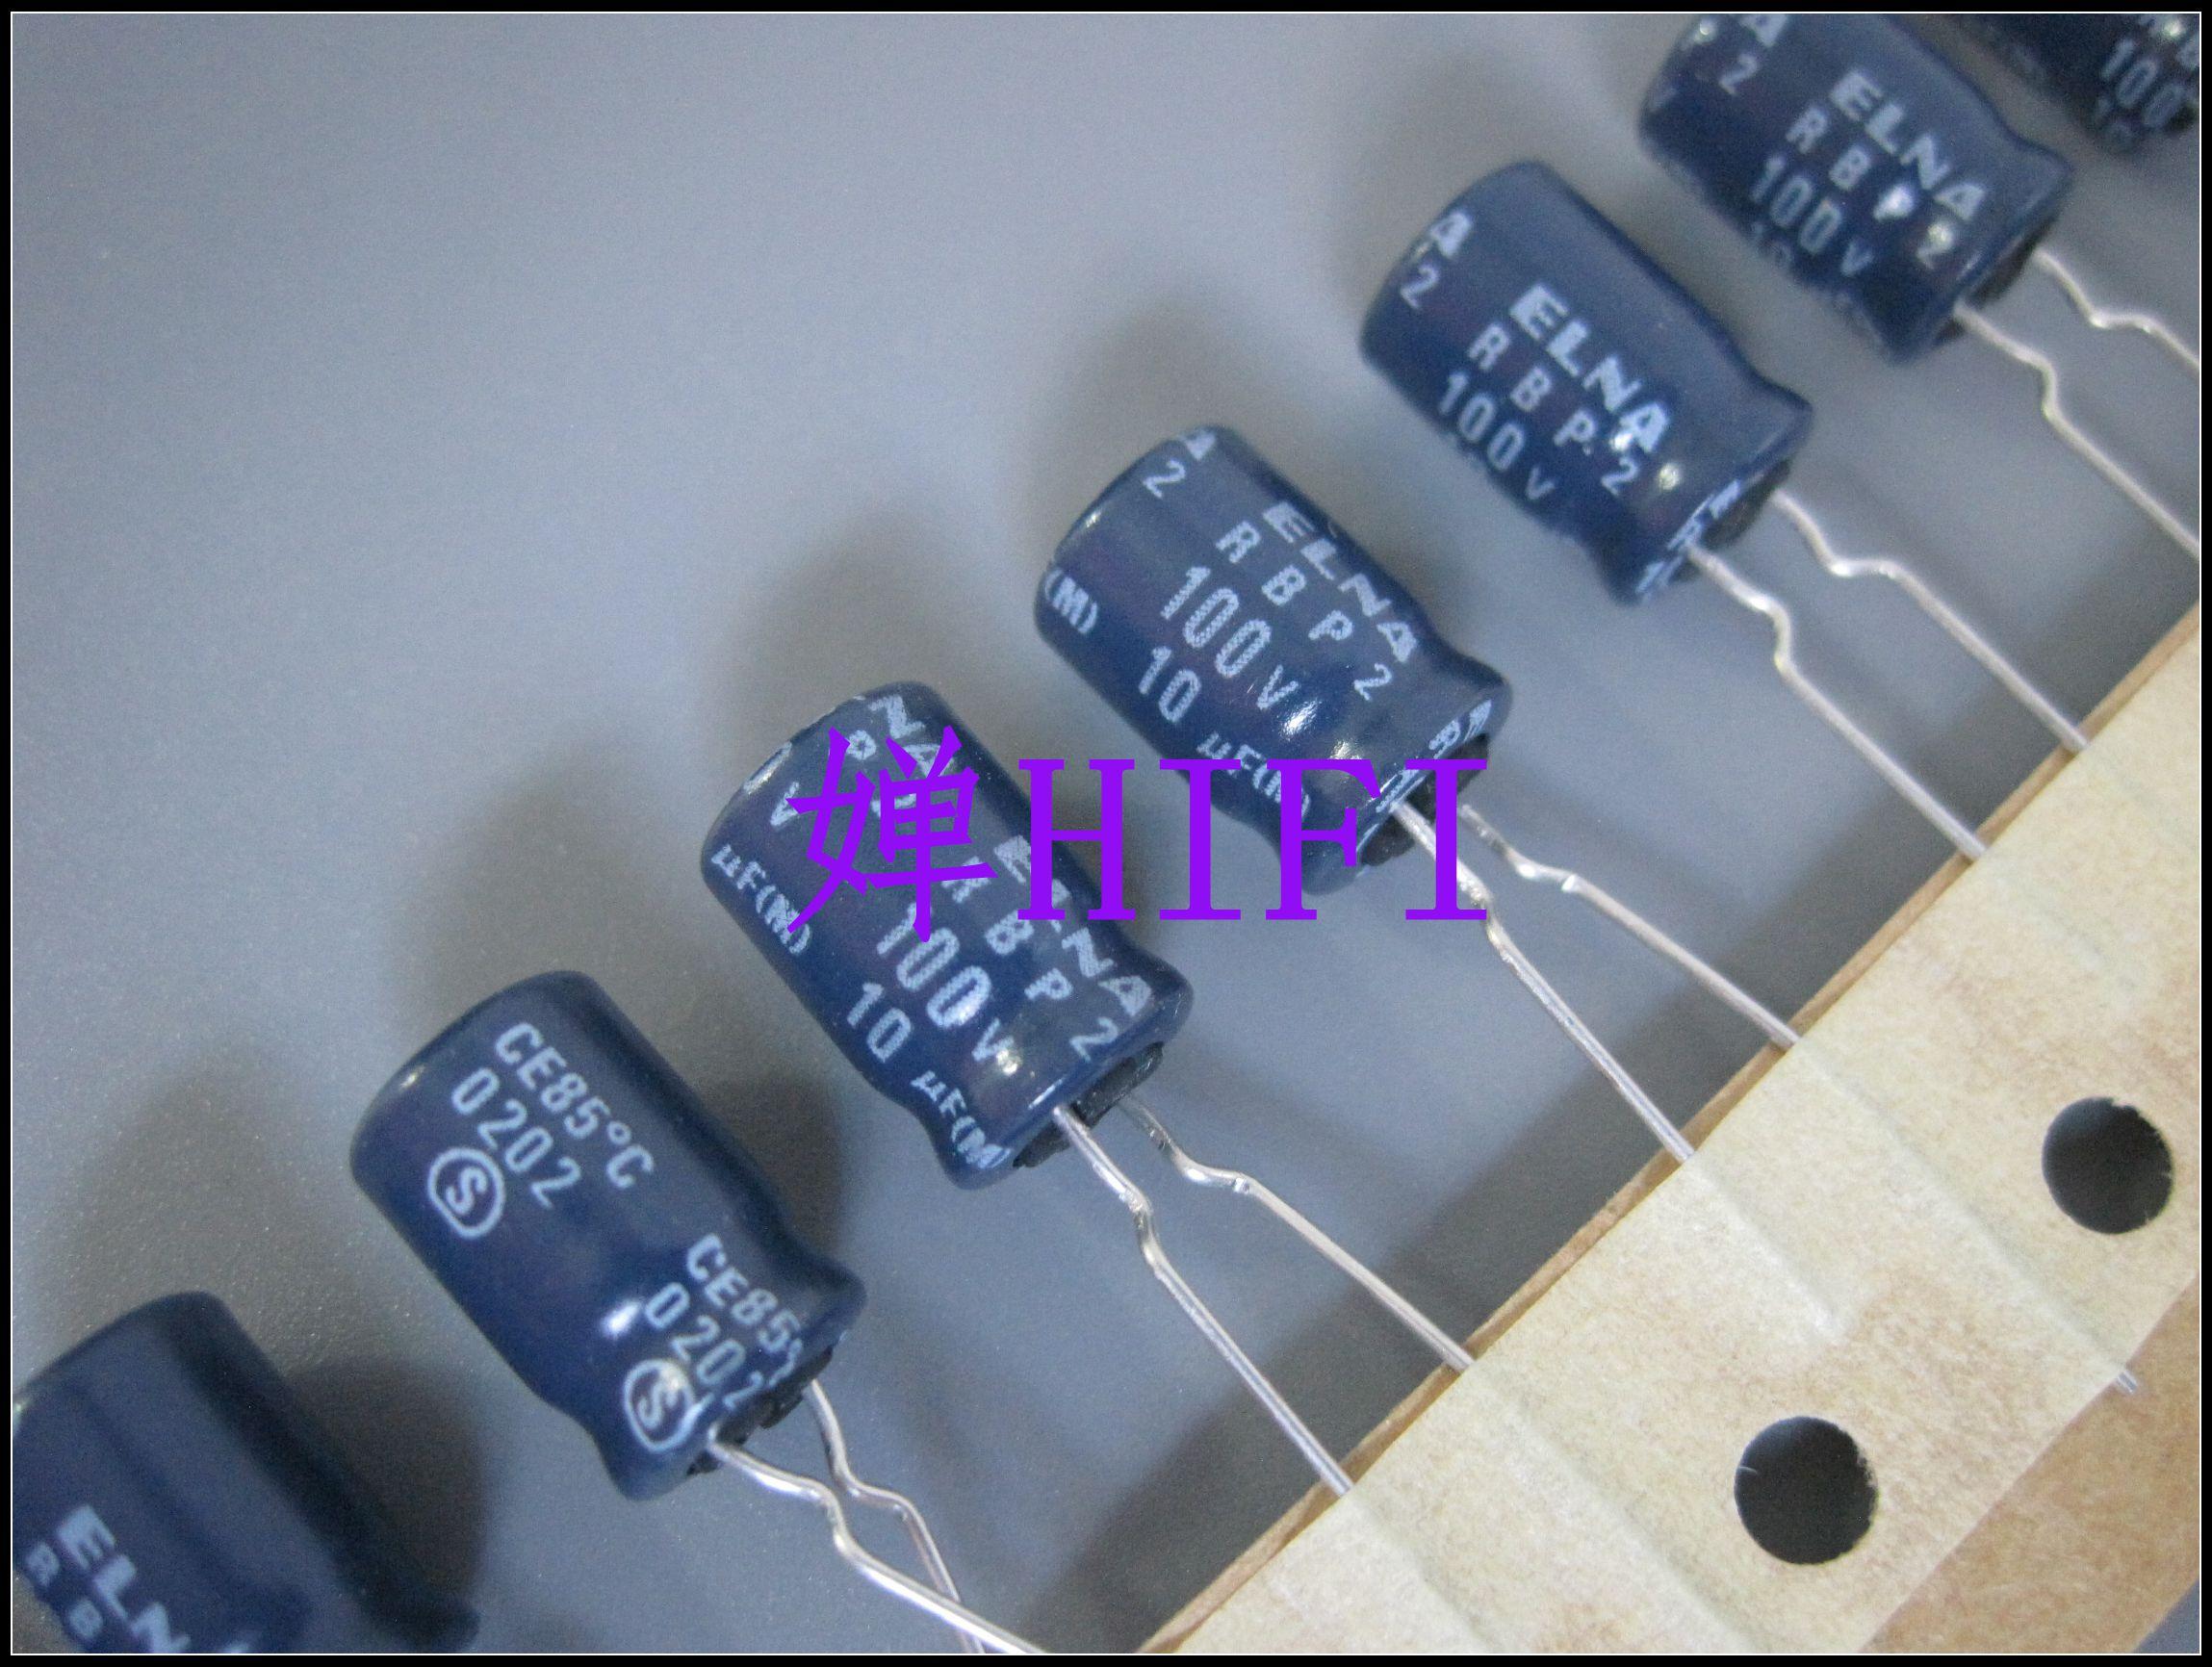 2020 hot sale 20PCS/50PCS ELNA original 100V10UF RBP2 non-polar electrolytic capacitor electrolysis free shipping 2020 hot sale holland bc 20pcs 50pcs 82pf 100v 2